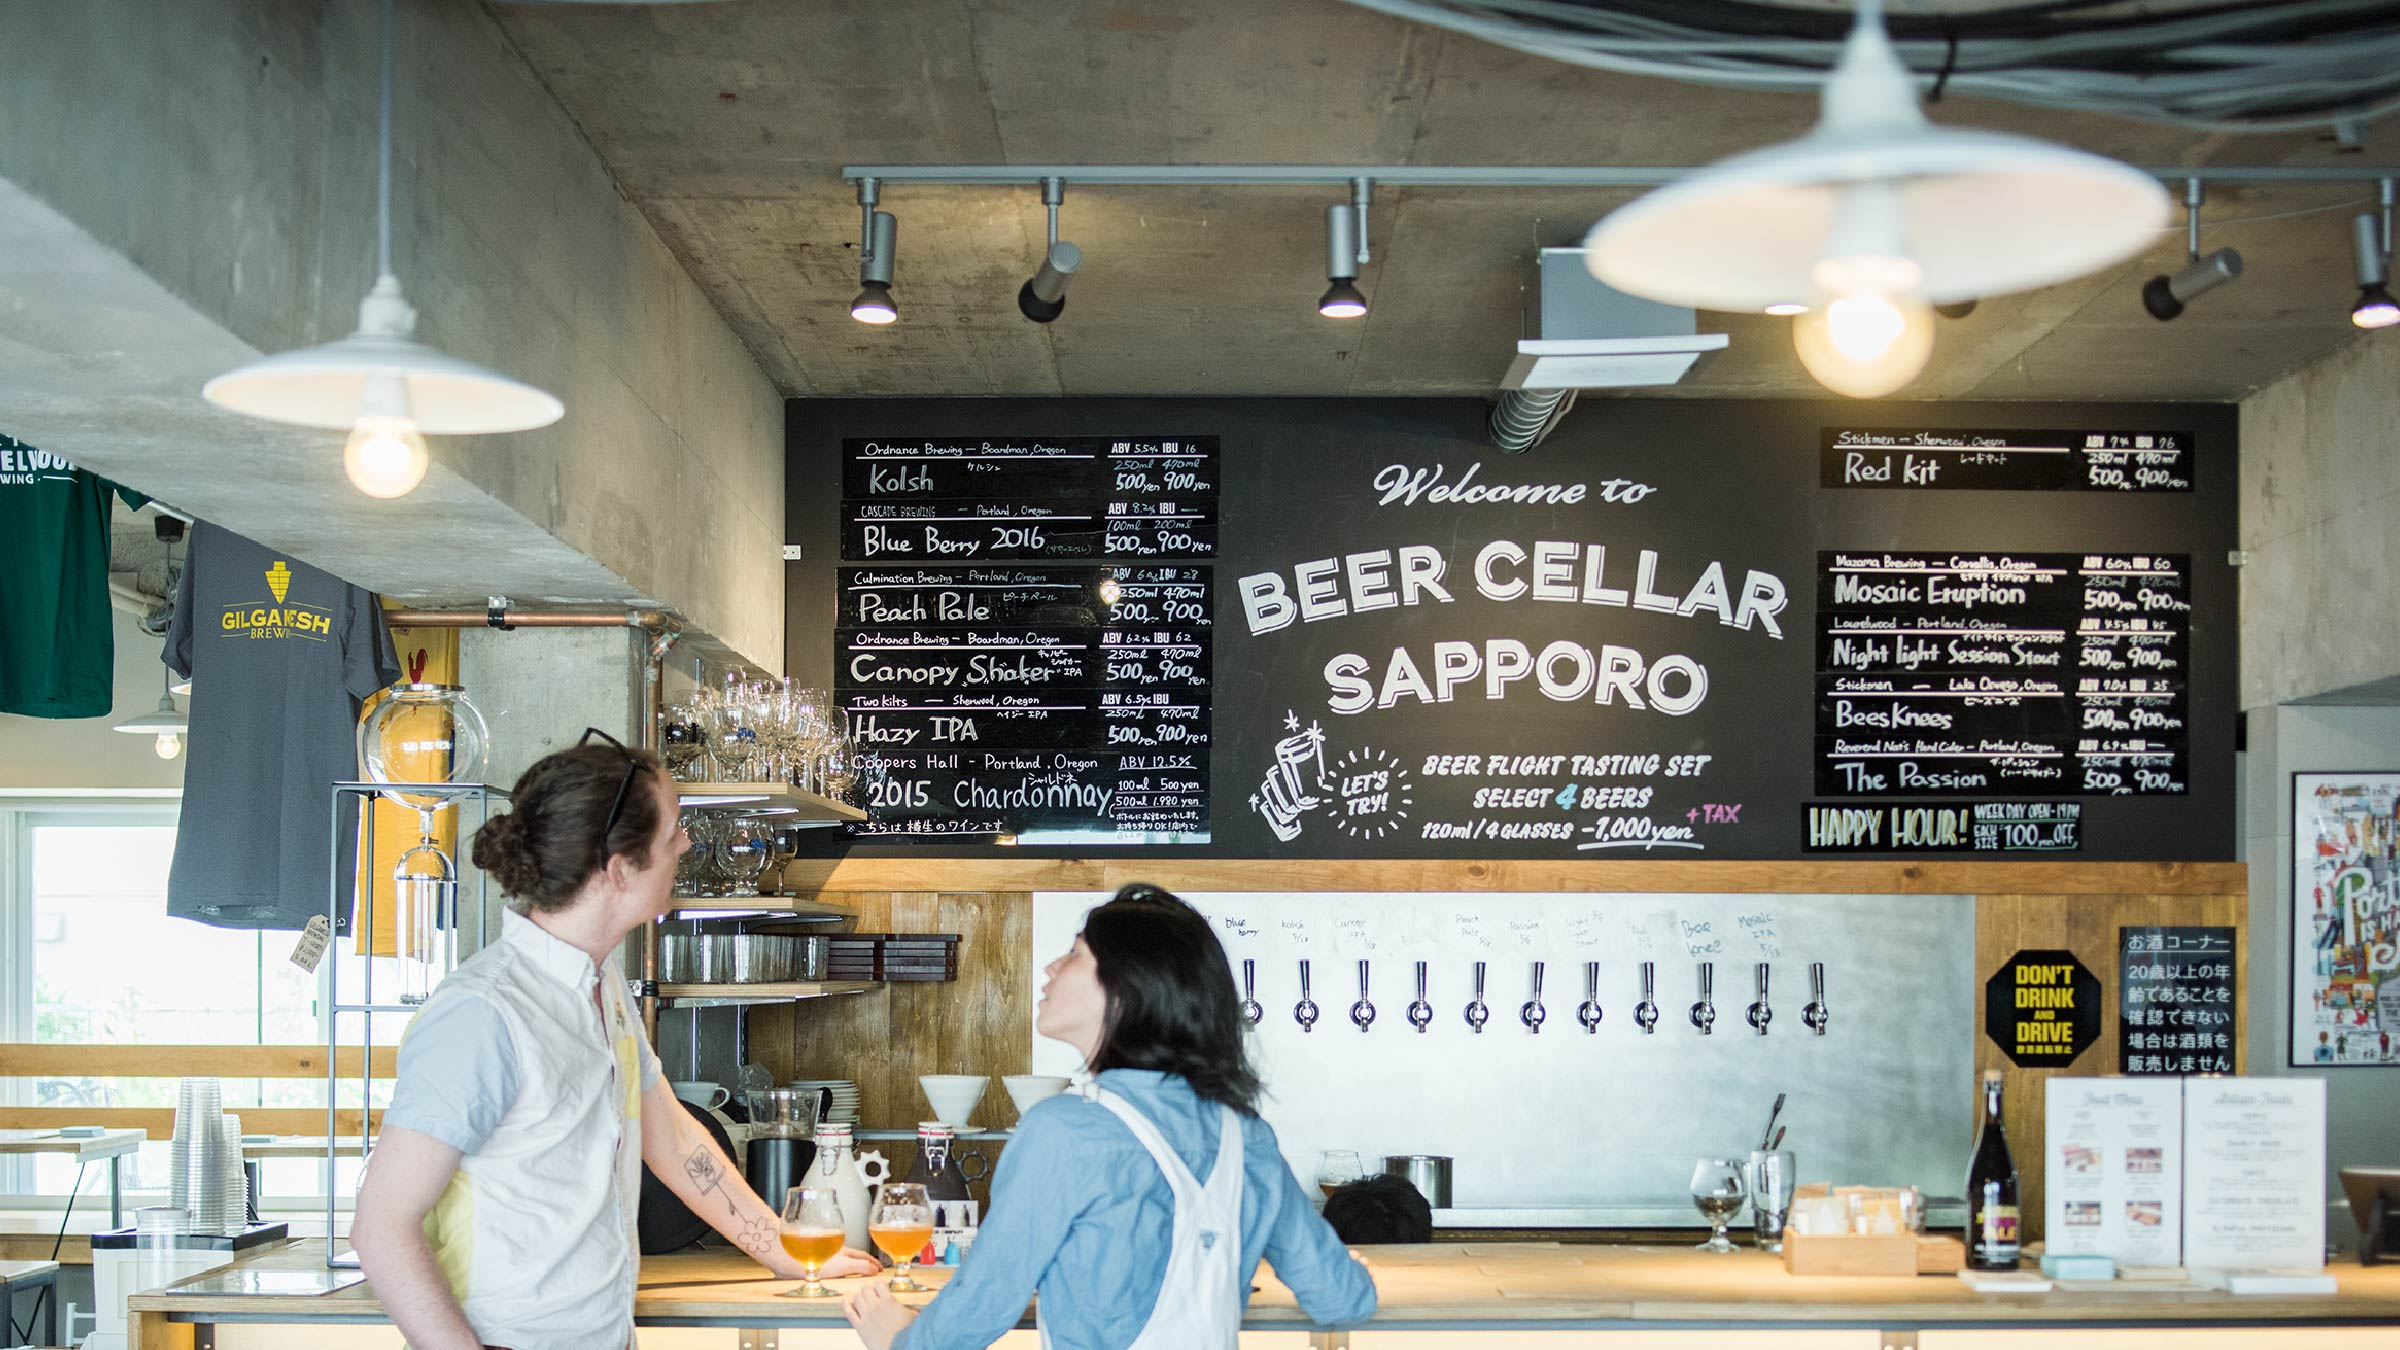 BEER CELLAR SAPPORO イメージ